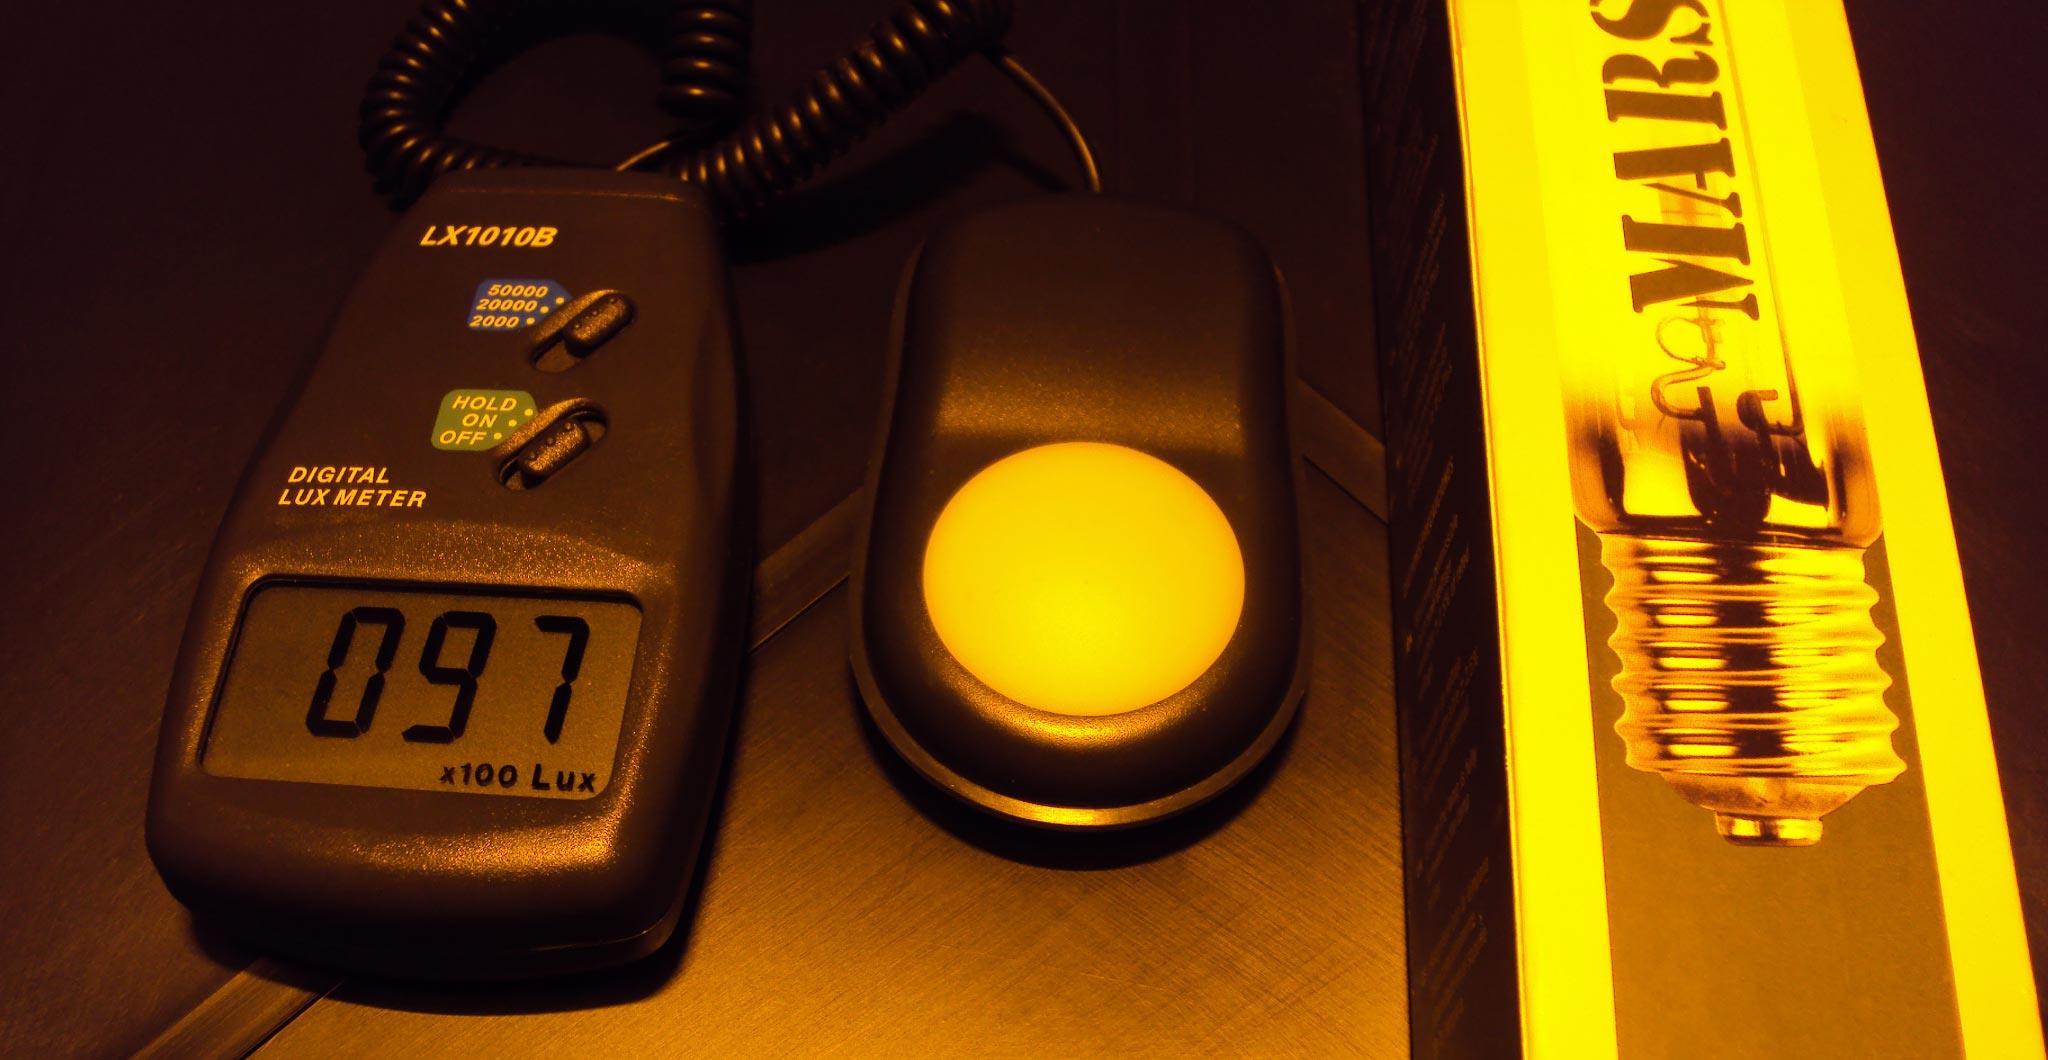 Comparatif Watts Santyerbasi 600 Blog Lampes 400 Hps XOuZwPlkiT